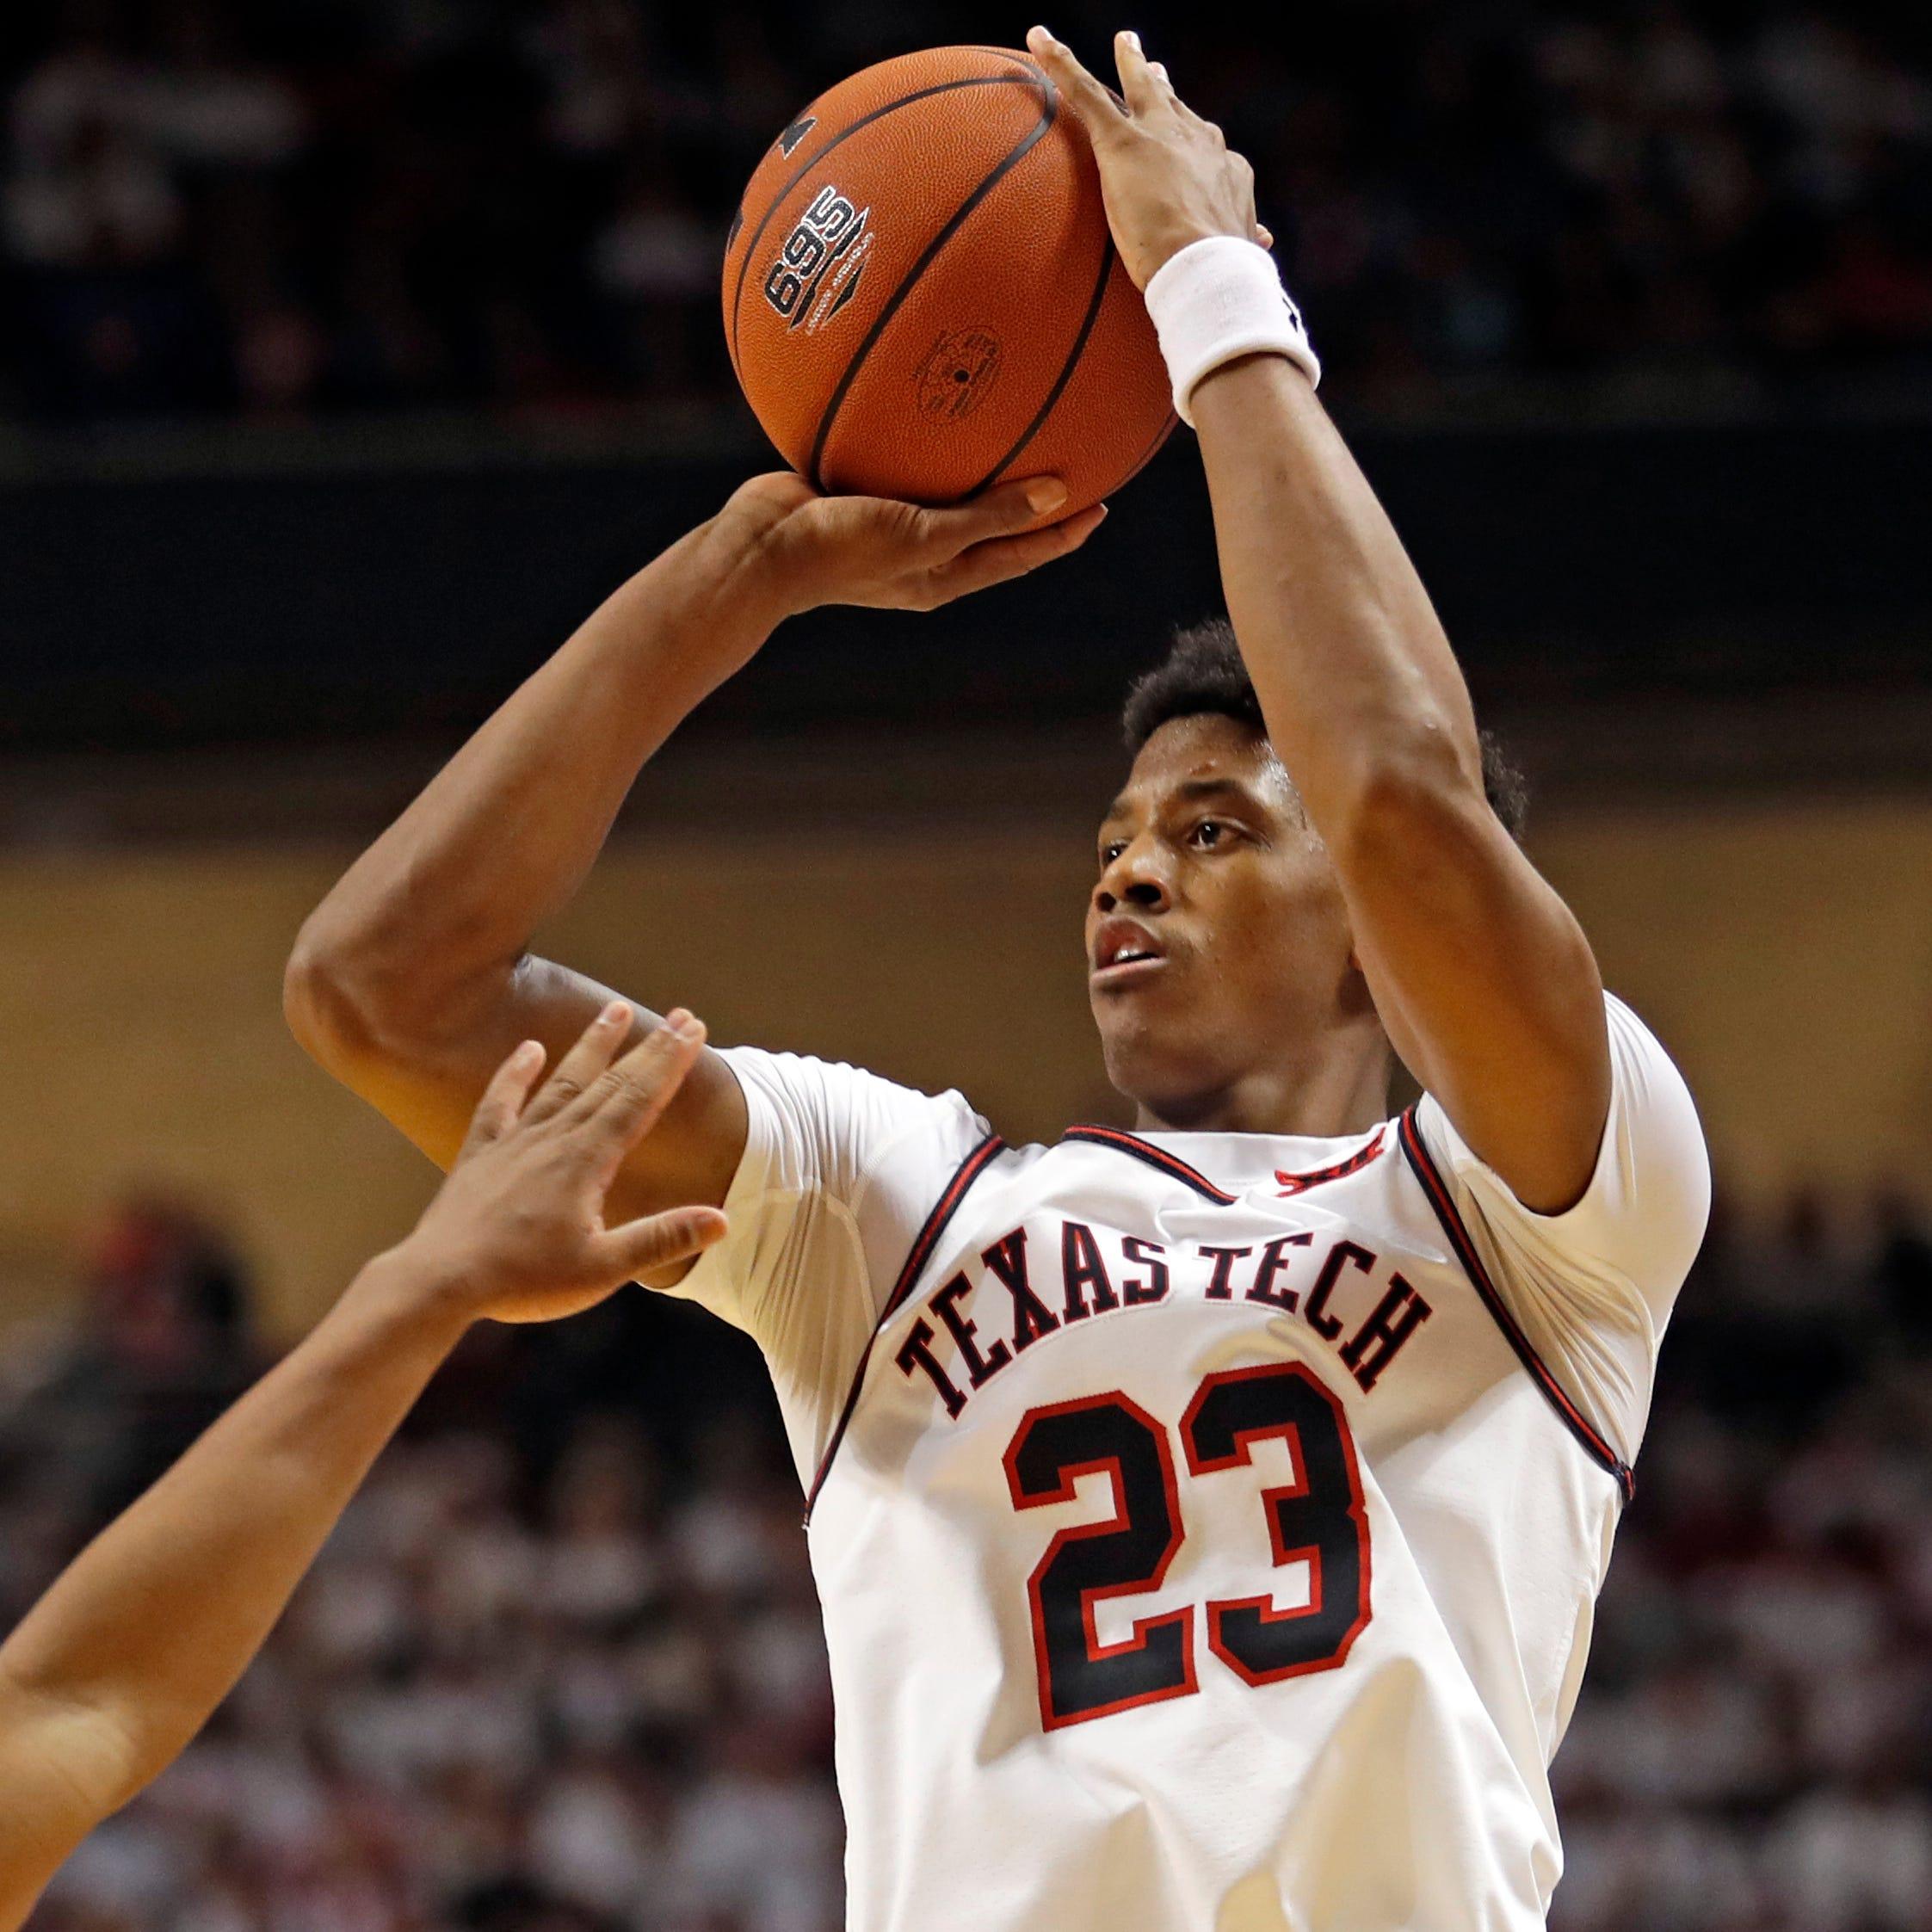 Big 12 Basketball: No. 14 Texas Tech pounds No. 12 Kansas